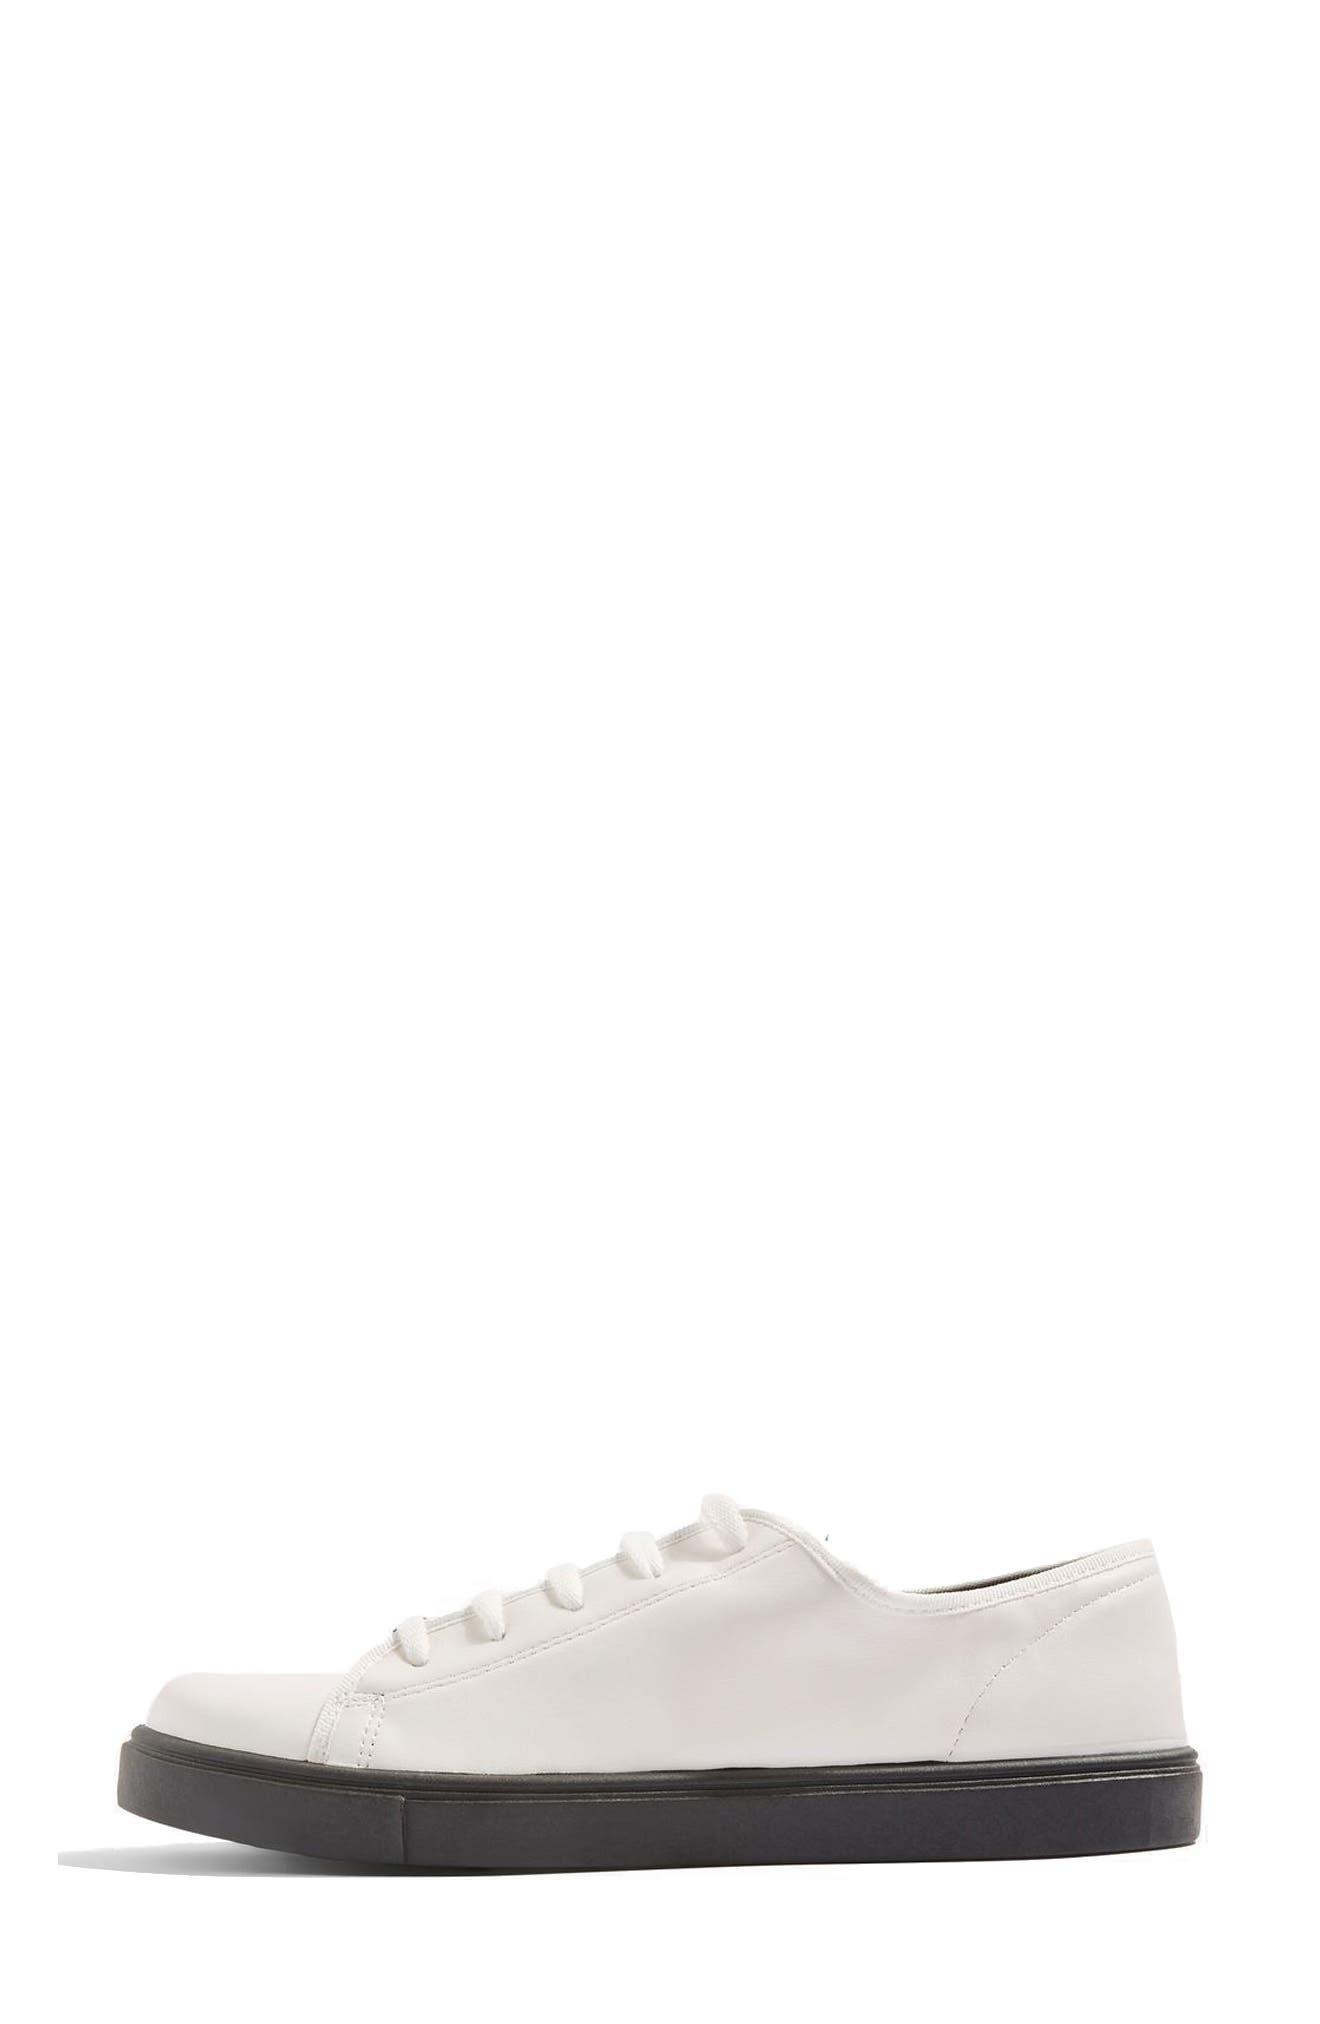 Crush Waterproof Contrast Sole Sneaker,                             Alternate thumbnail 2, color,                             001